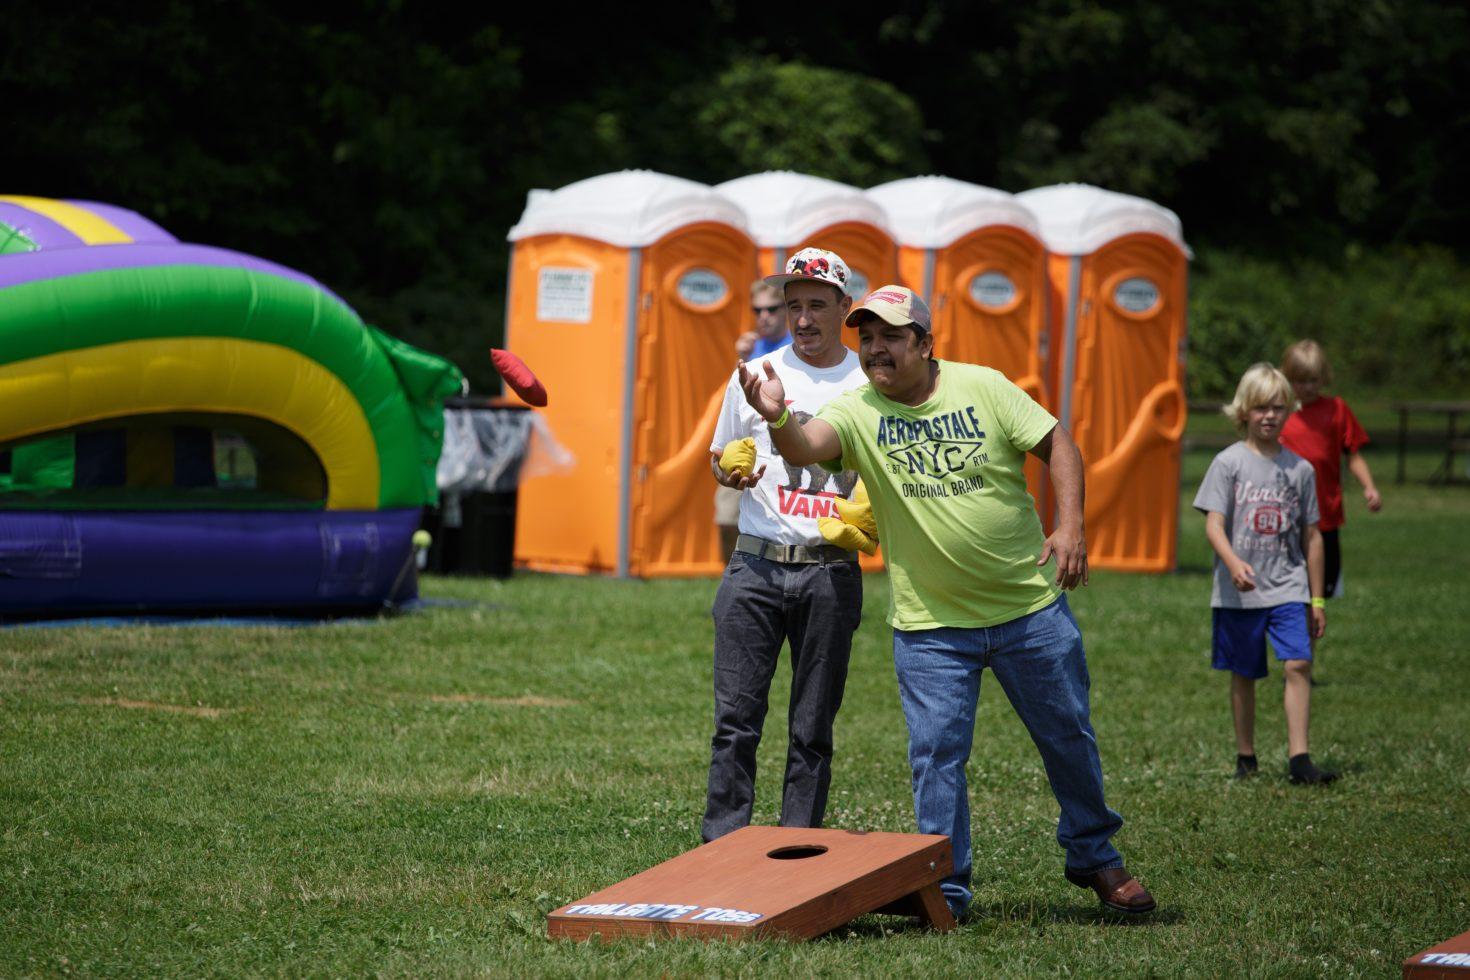 Men playing tailgate toss game